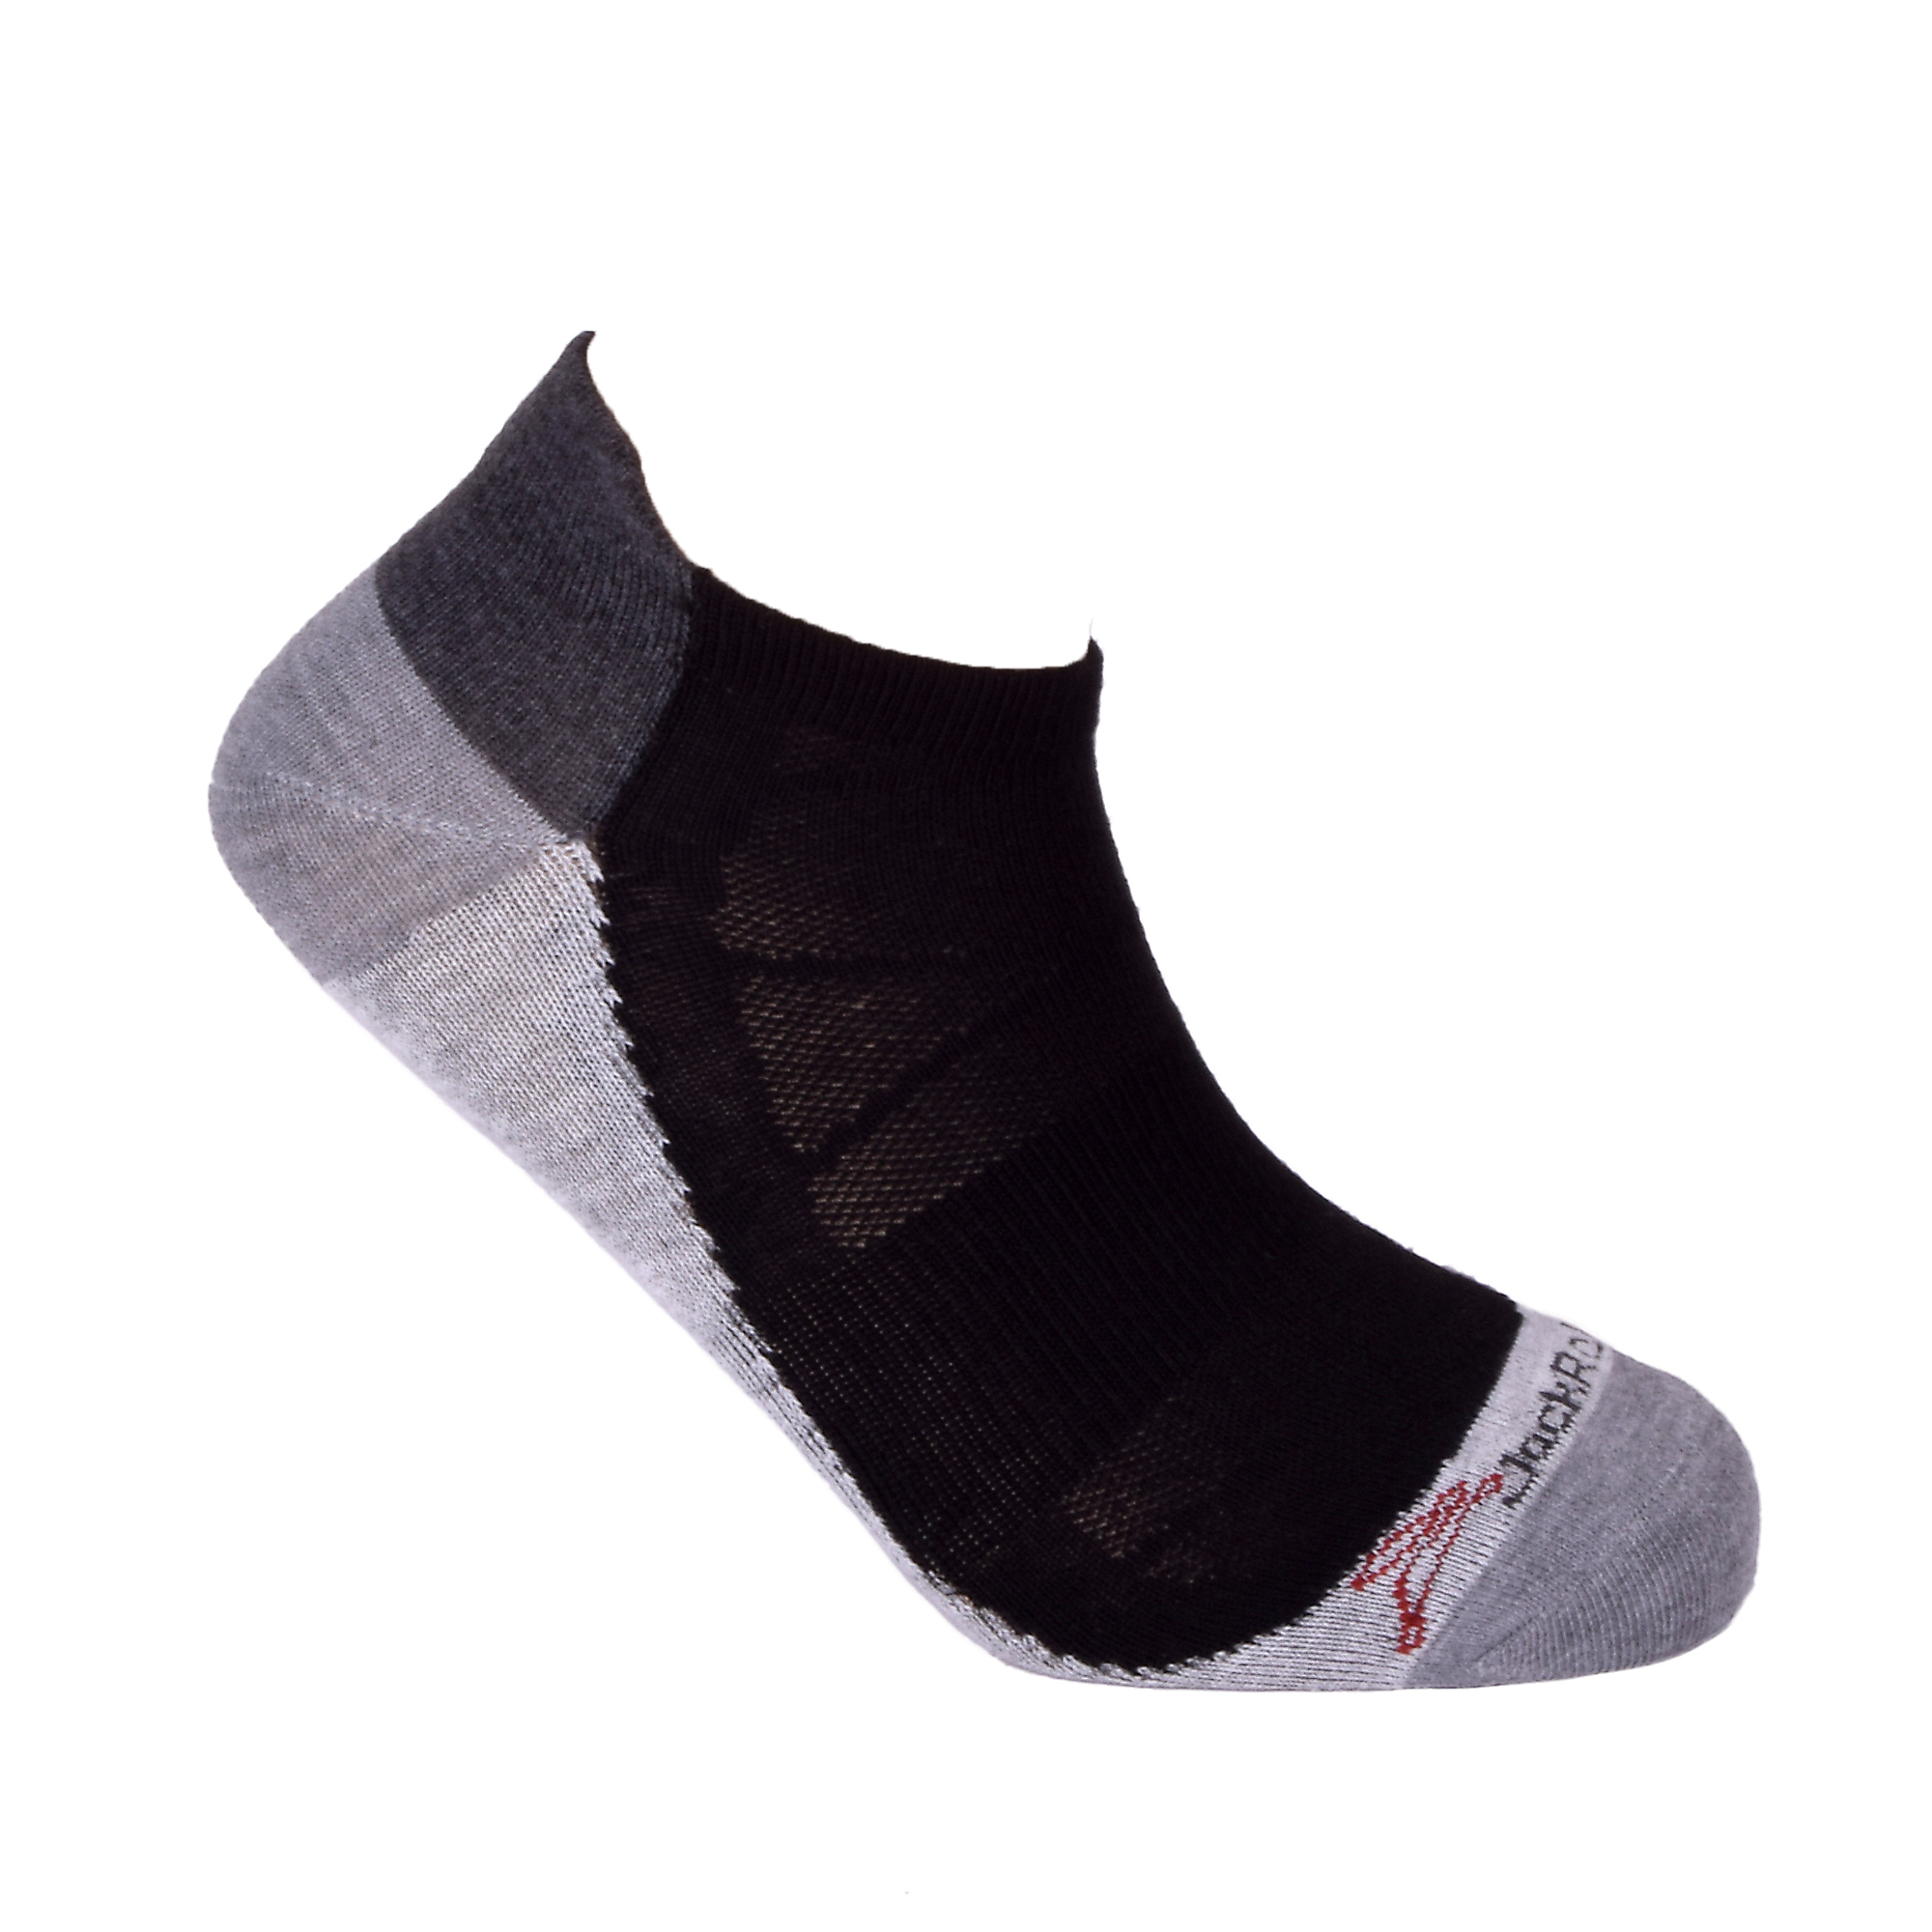 JackRabbit No Show Tab Lite Performance Running Sock - Color: Black - Size: S, Black/Grey, large, image 3